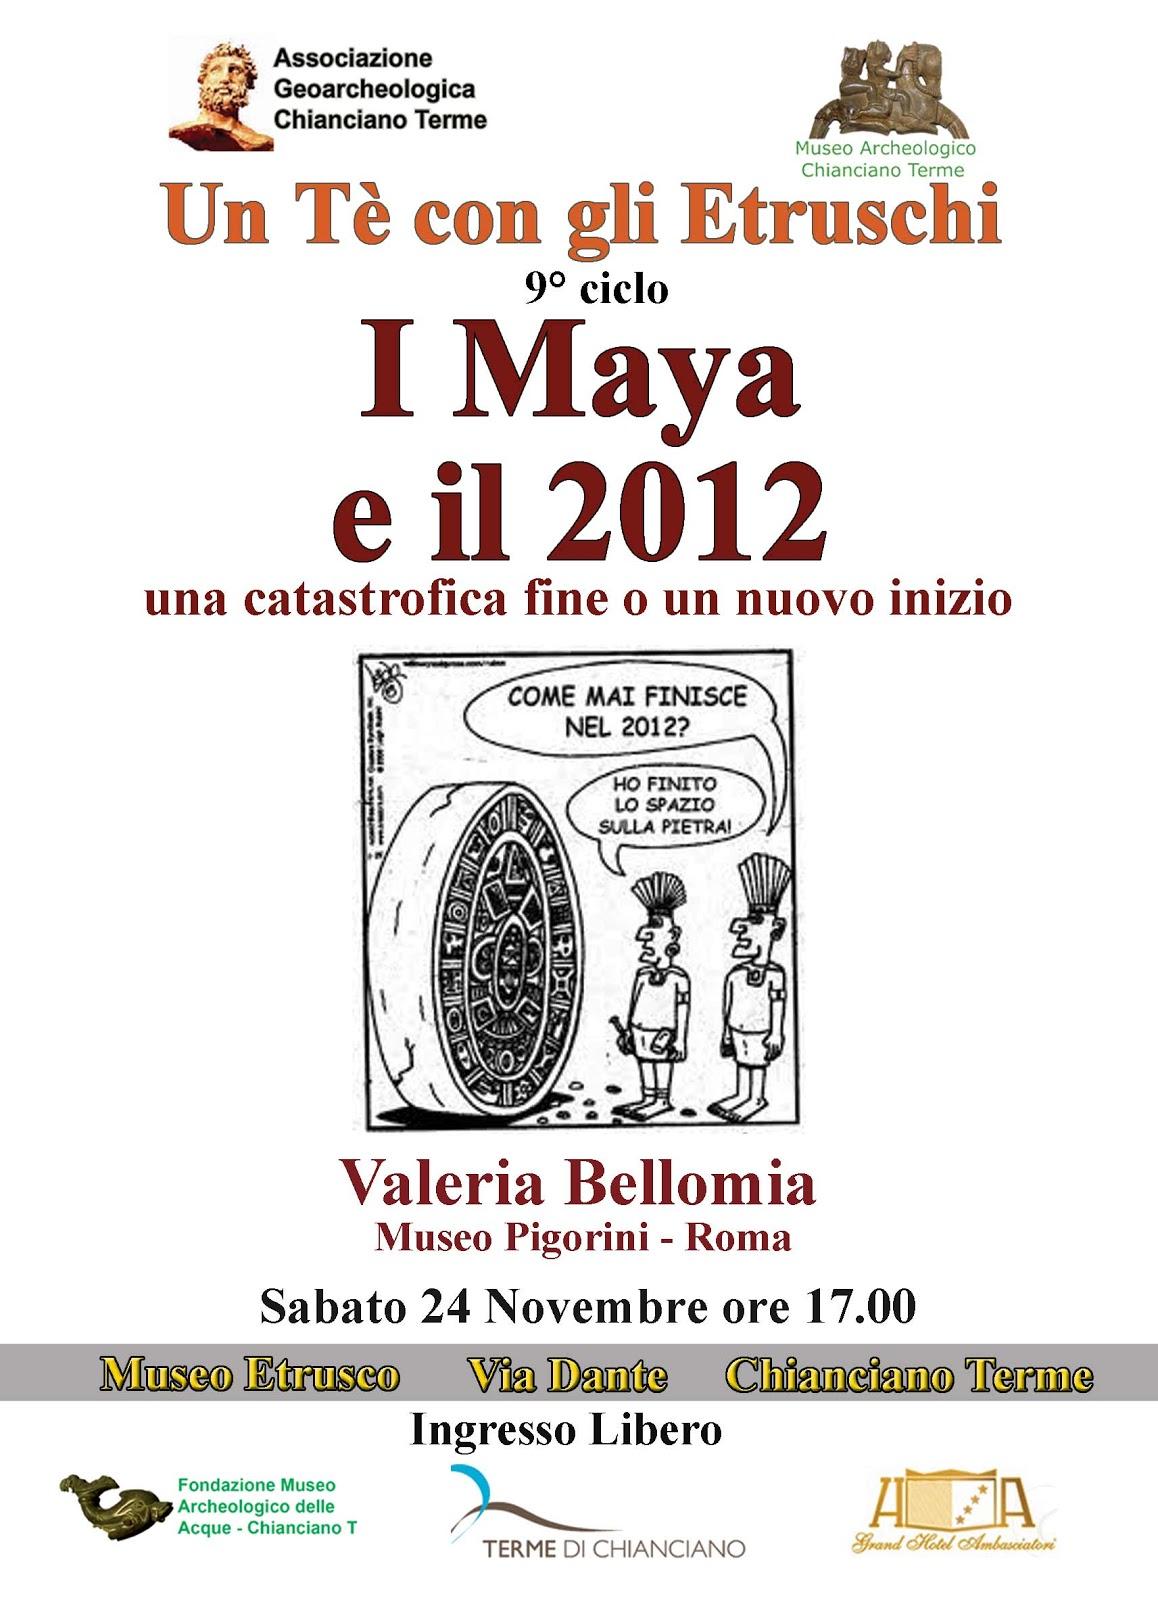 http://2.bp.blogspot.com/-qNY8DchfbYA/UK4IWVhhobI/AAAAAAAAQ9I/G7wvR_juym0/s1600/maya-2012.jpg